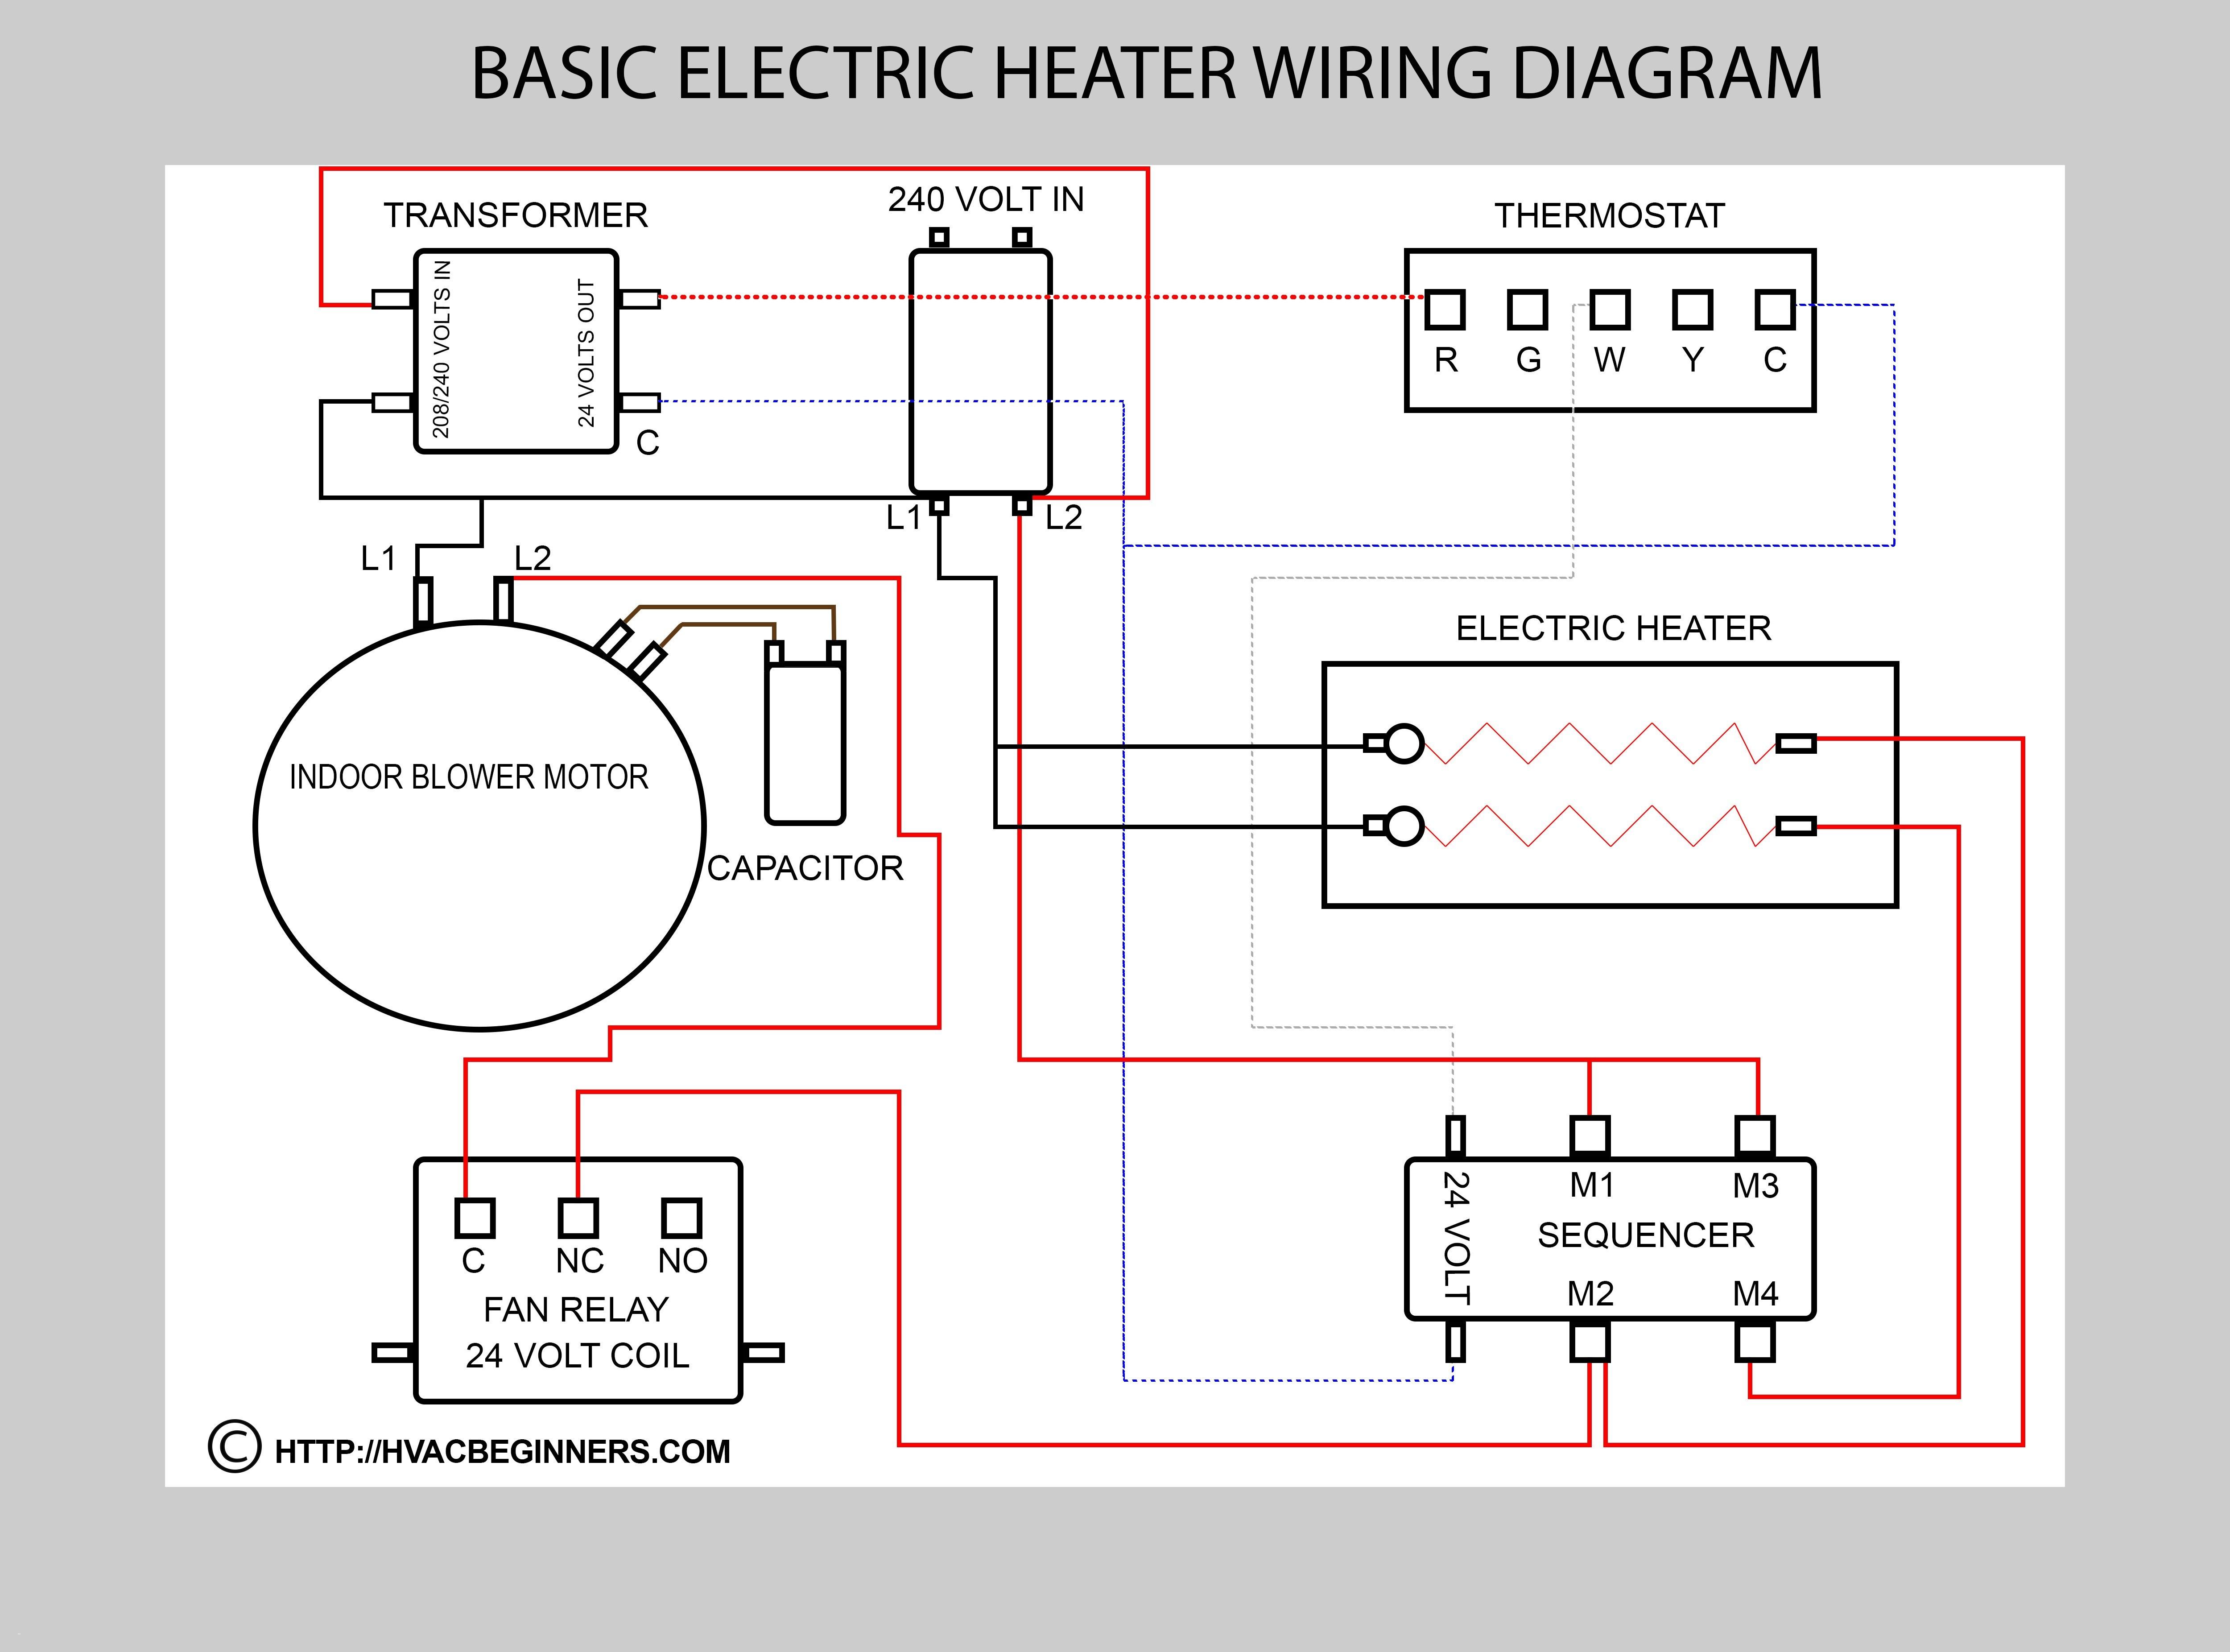 Furnace Wiring Diagram New Heat Furnace Diagram Wiring Diagram